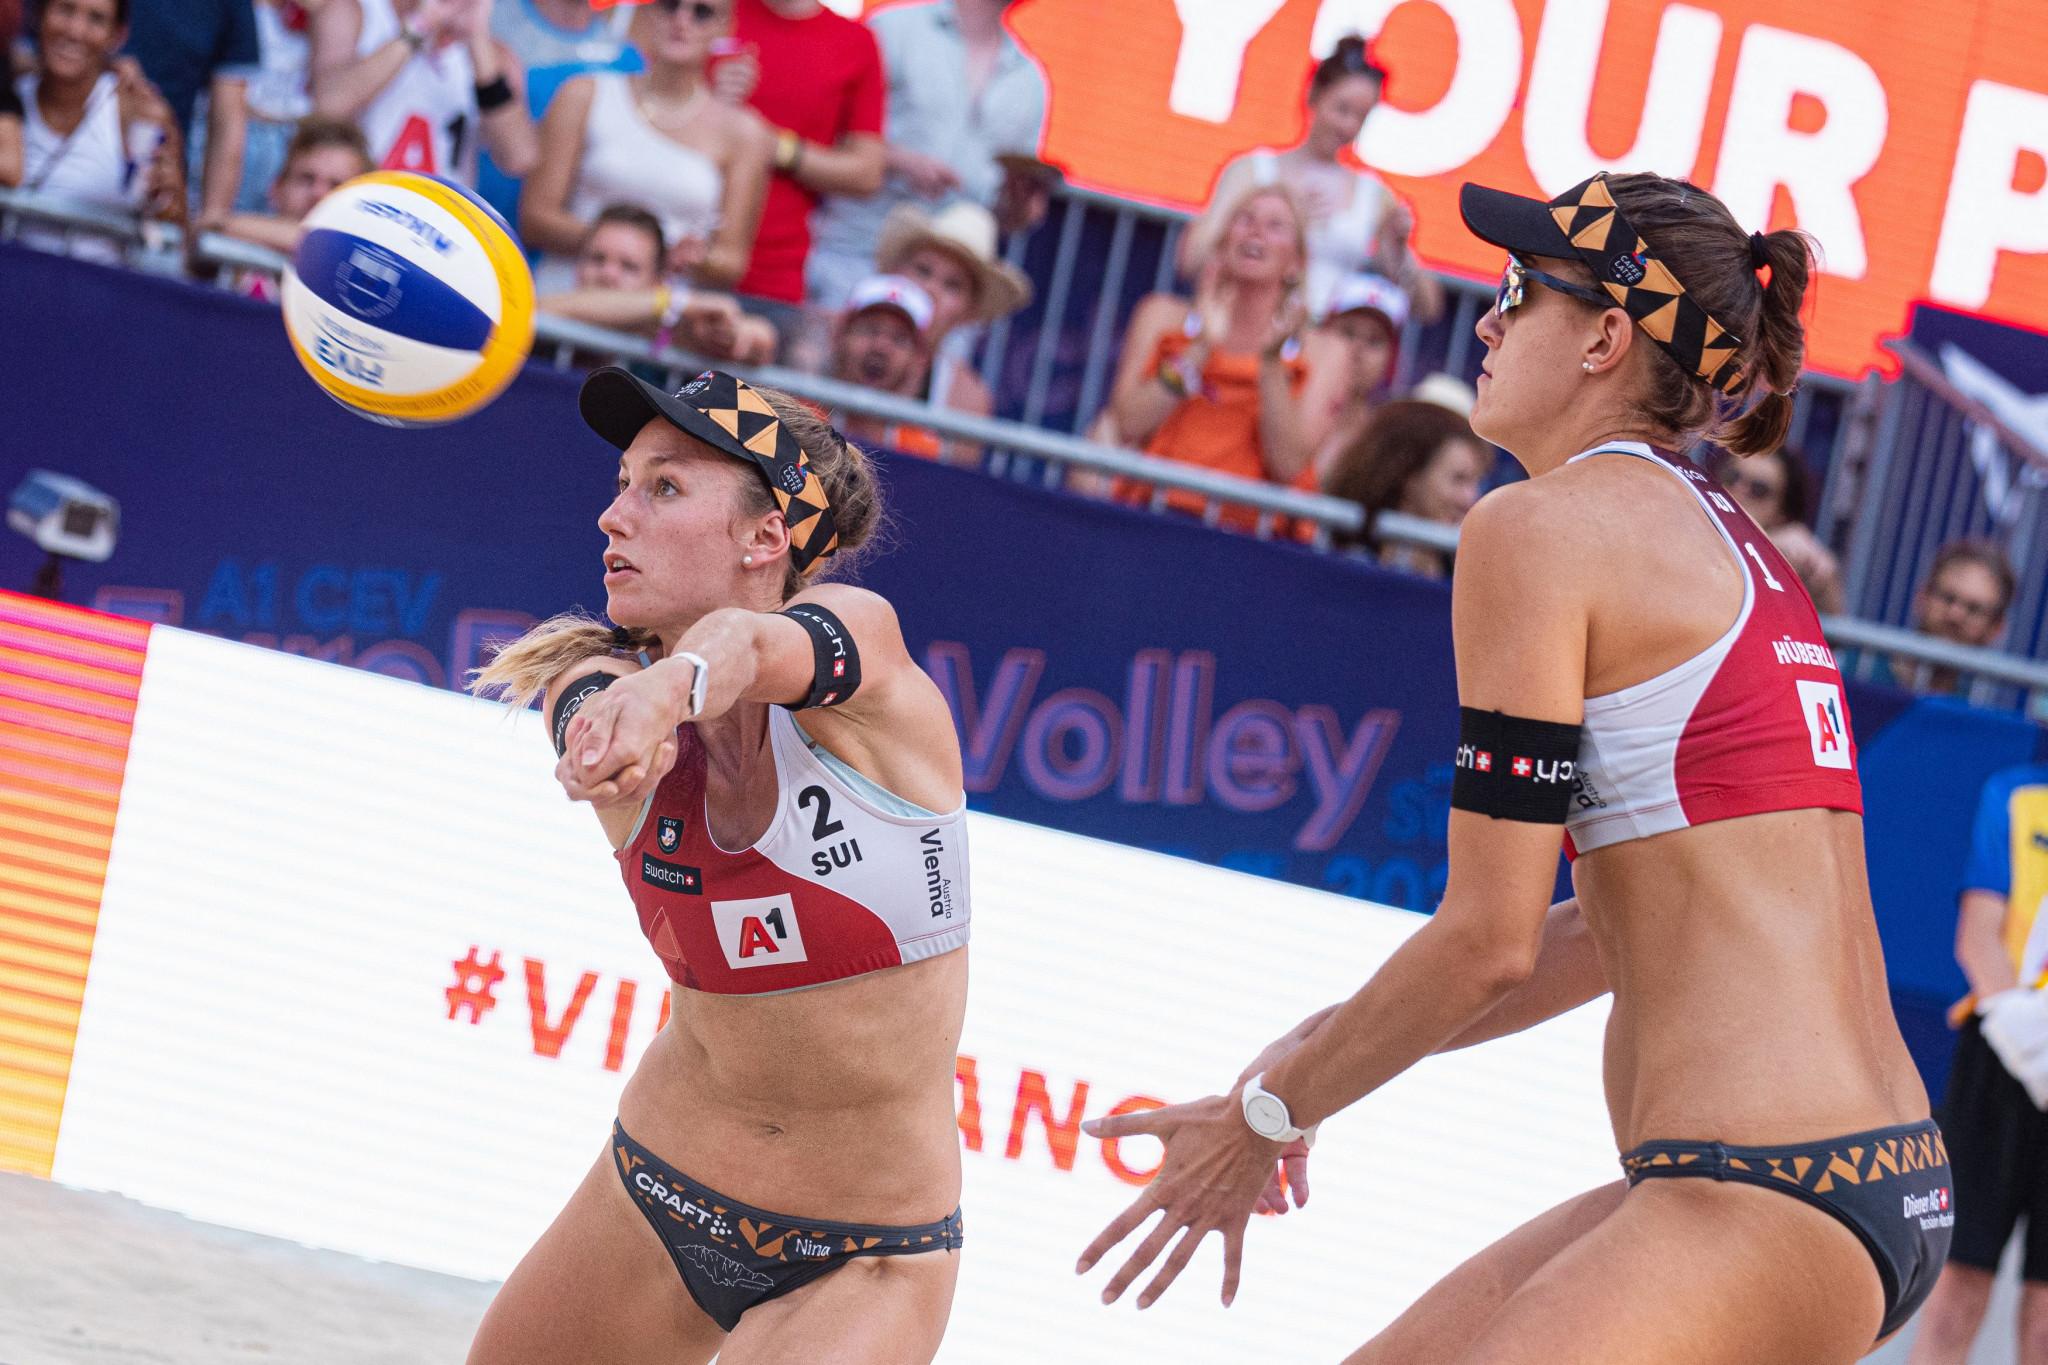 Betschart and Hüberli win EuroBeachVolley women's crown for Switzerland